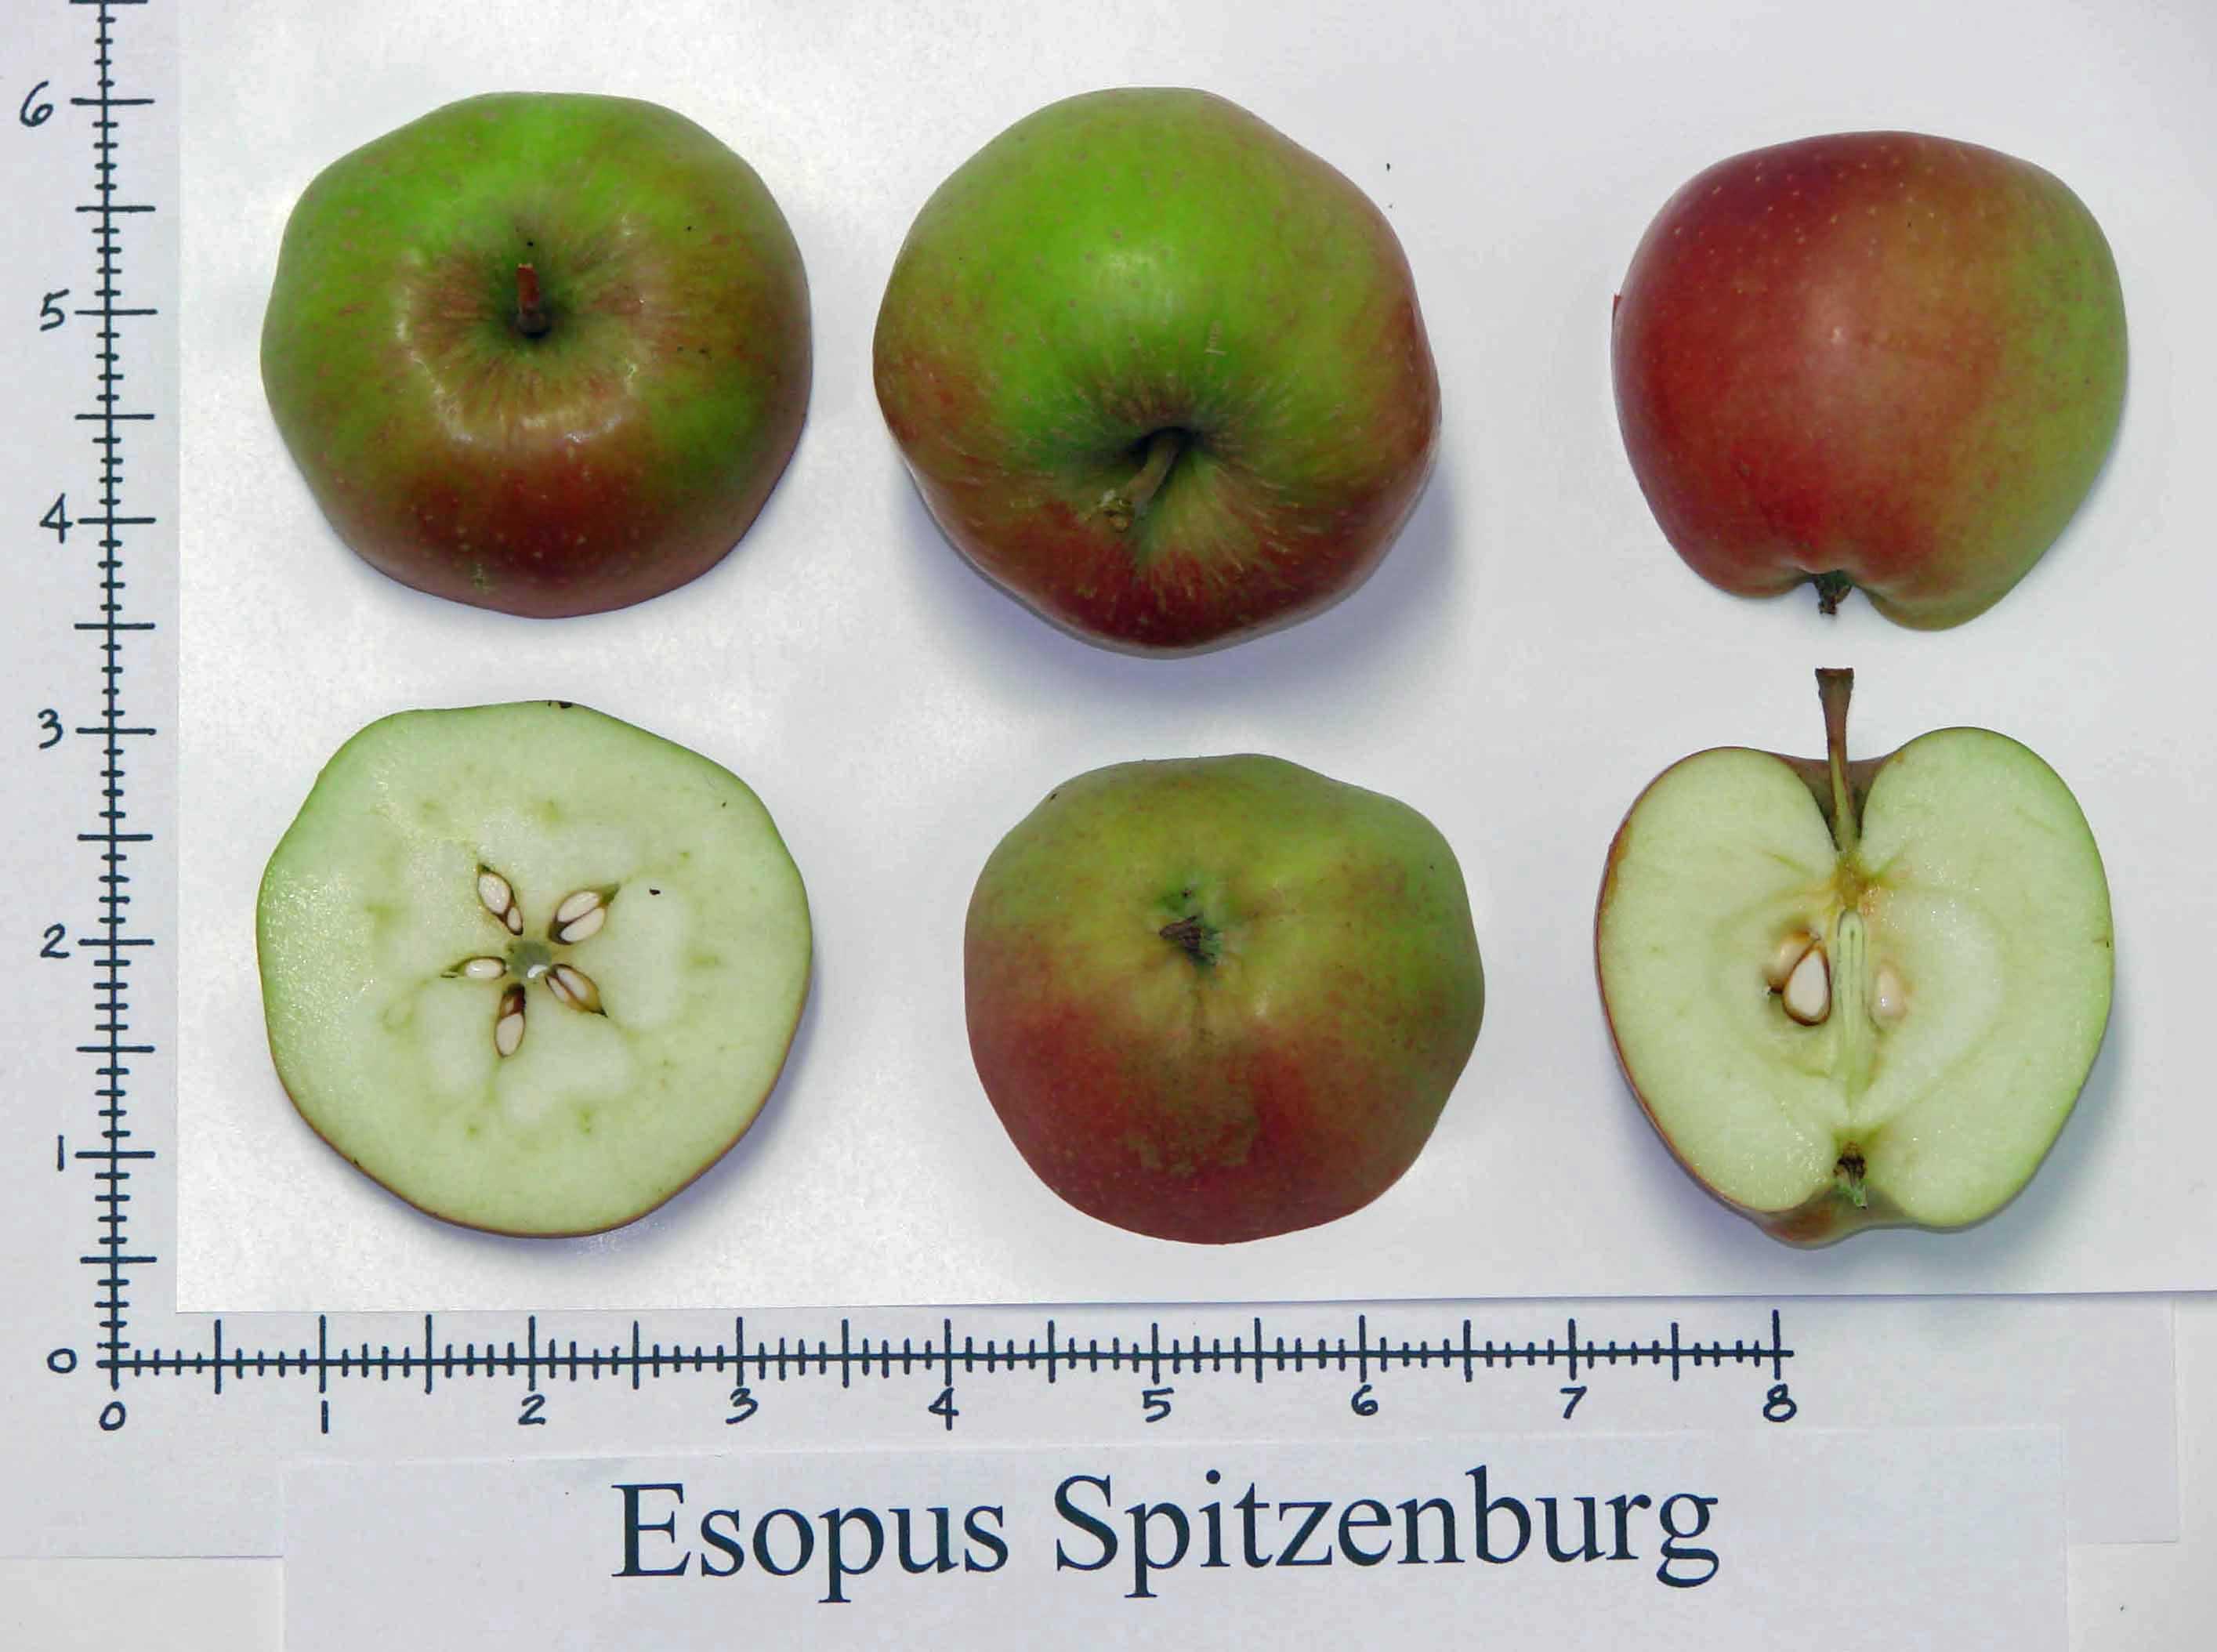 Esopus Spitzenburg